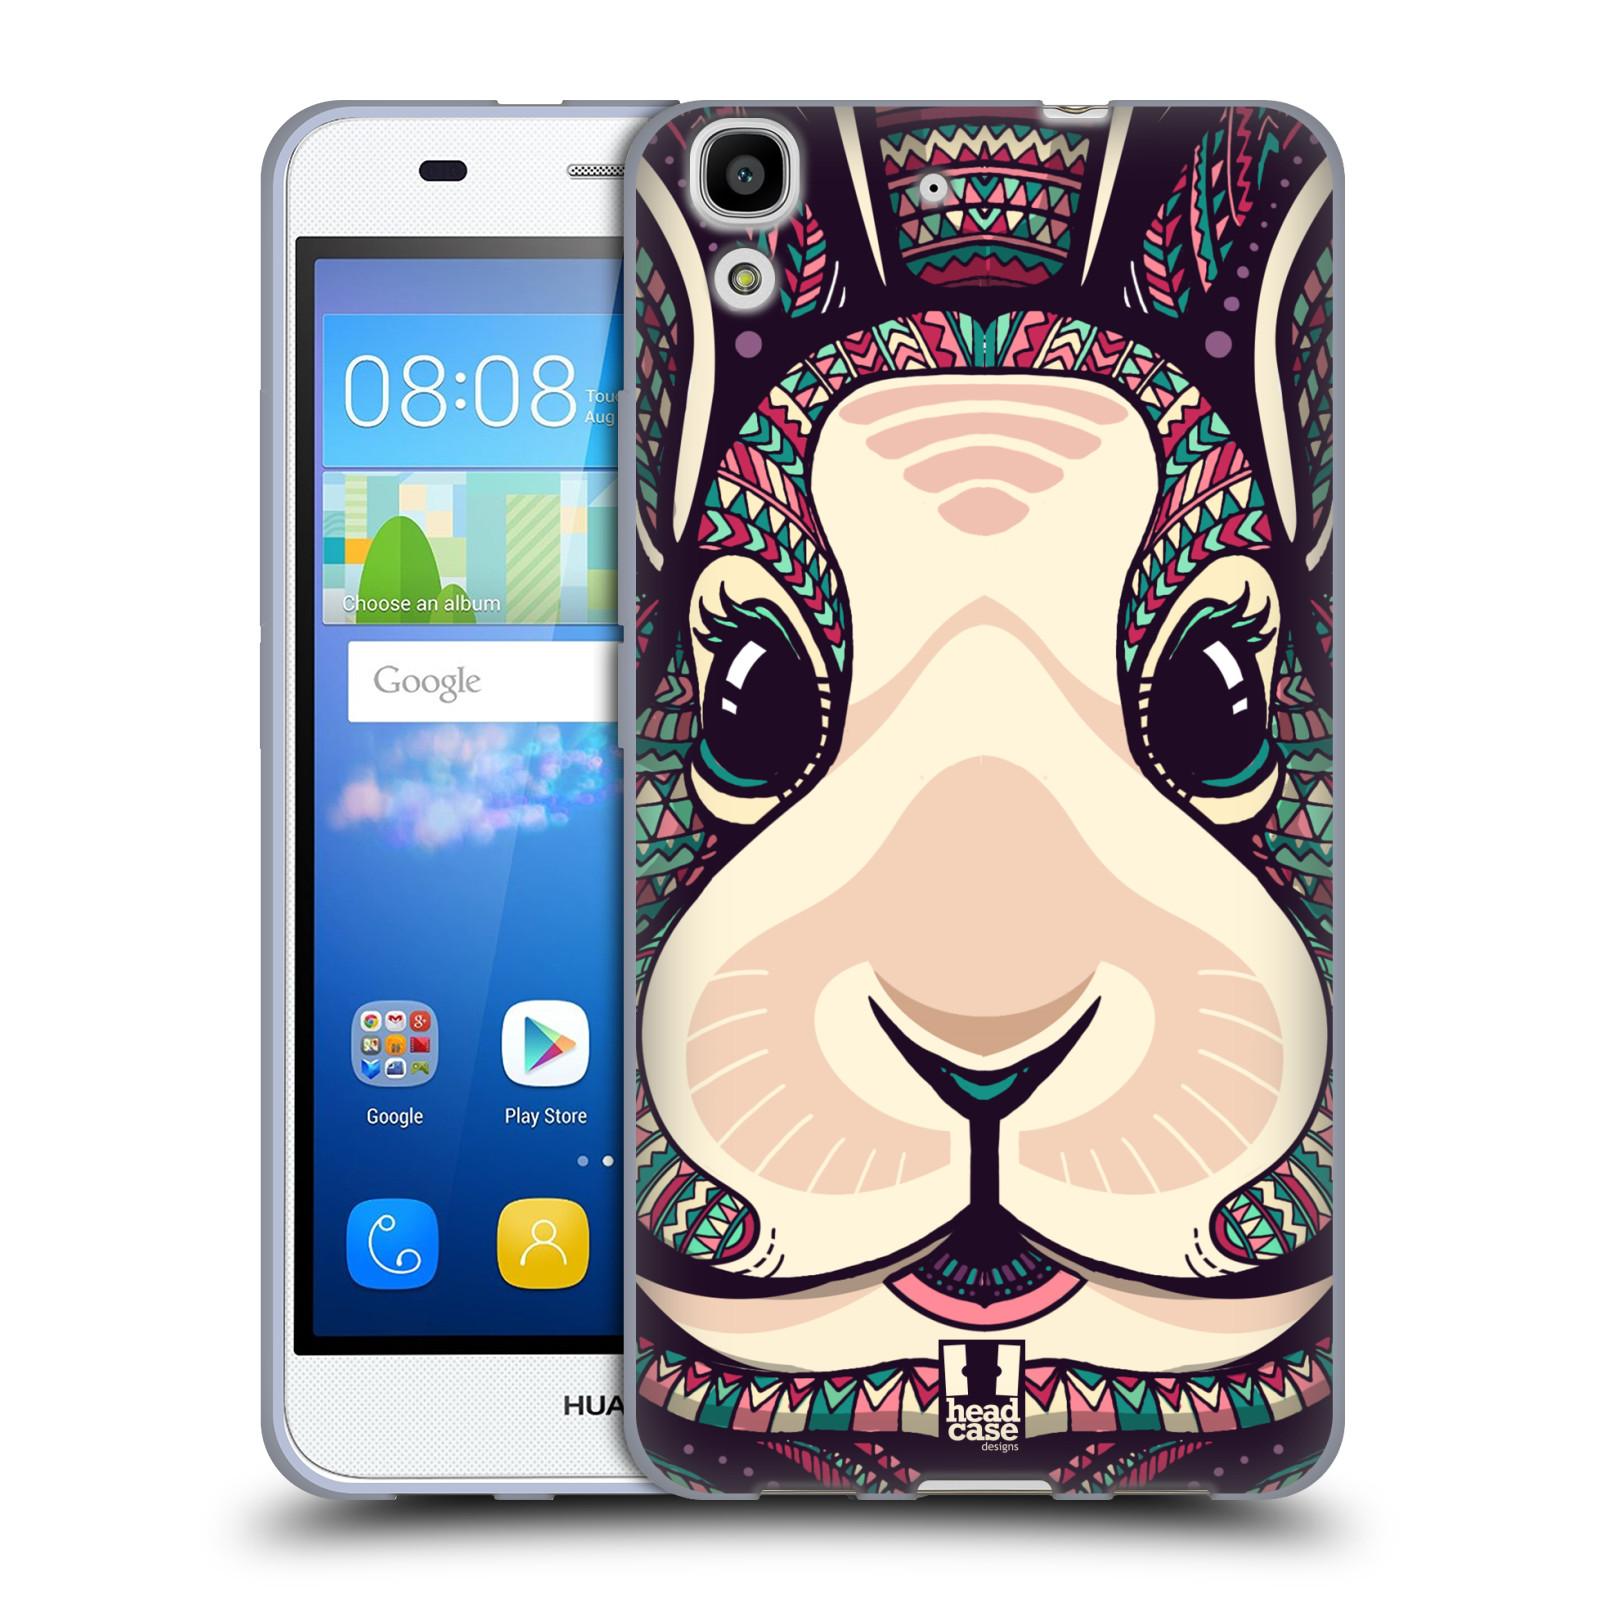 Silikonové pouzdro na mobil Huawei Y6 HEAD CASE AZTEC ZAJÍČEK